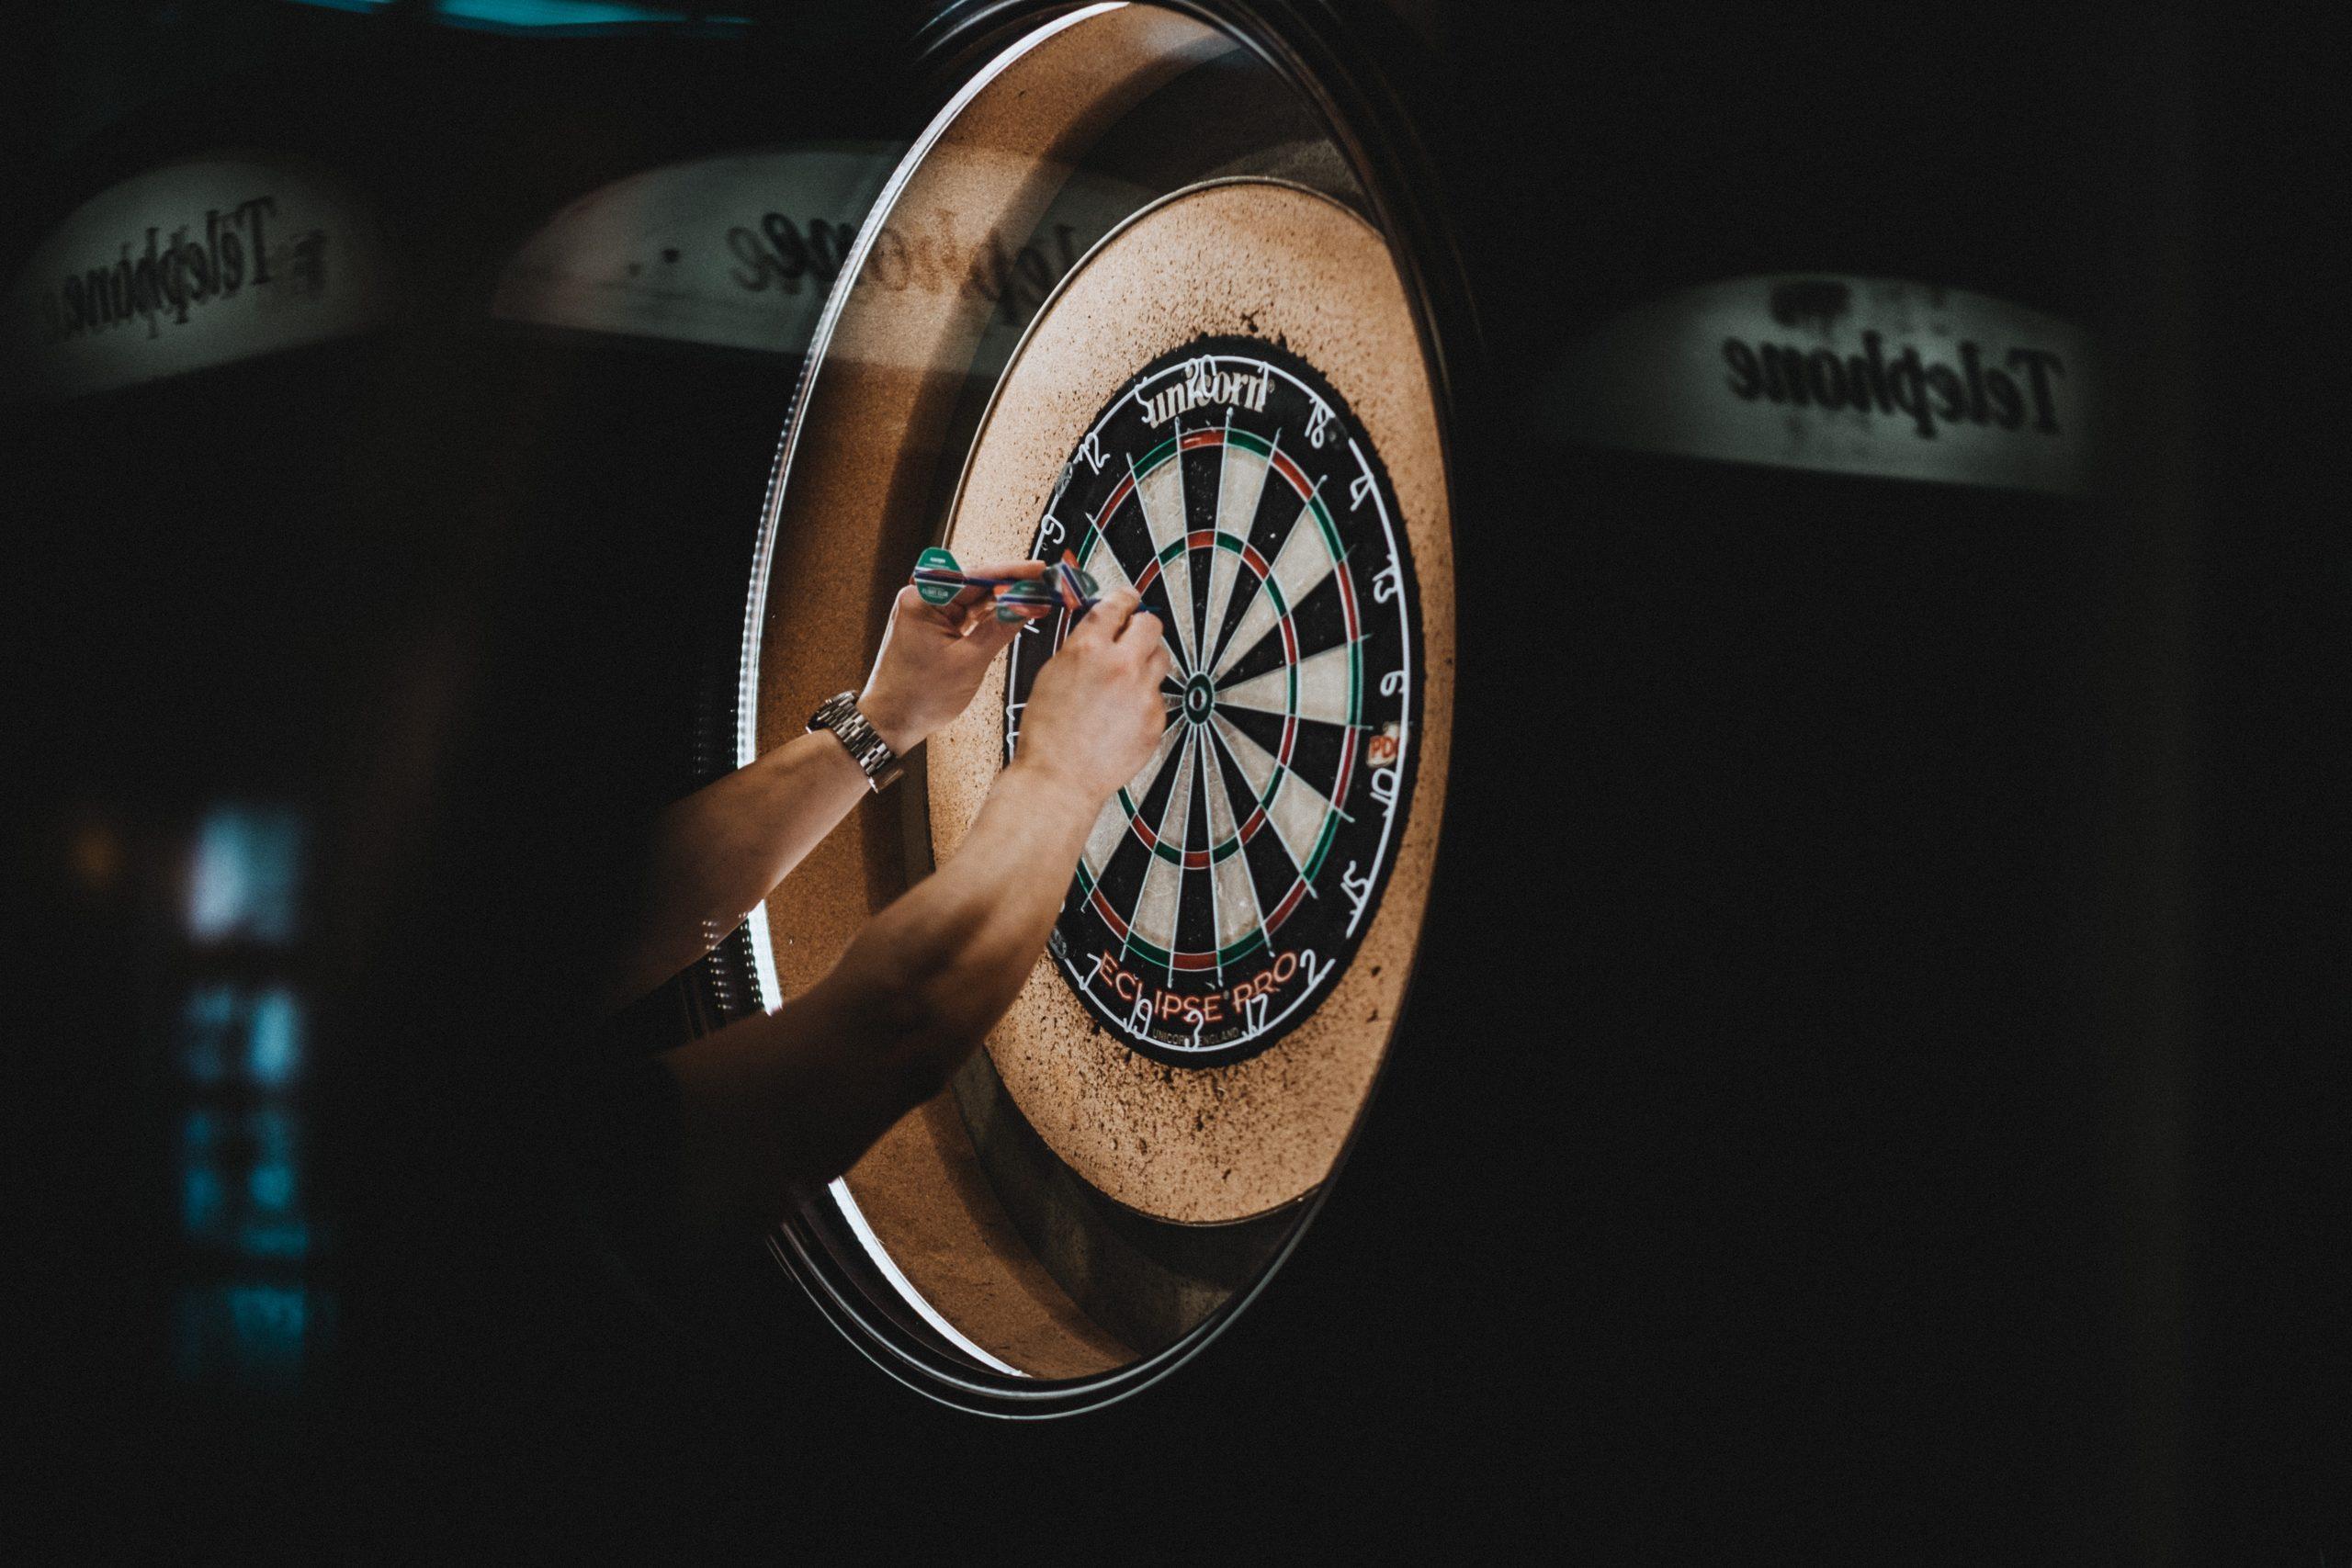 hands grabbing darts from dart board in dark room